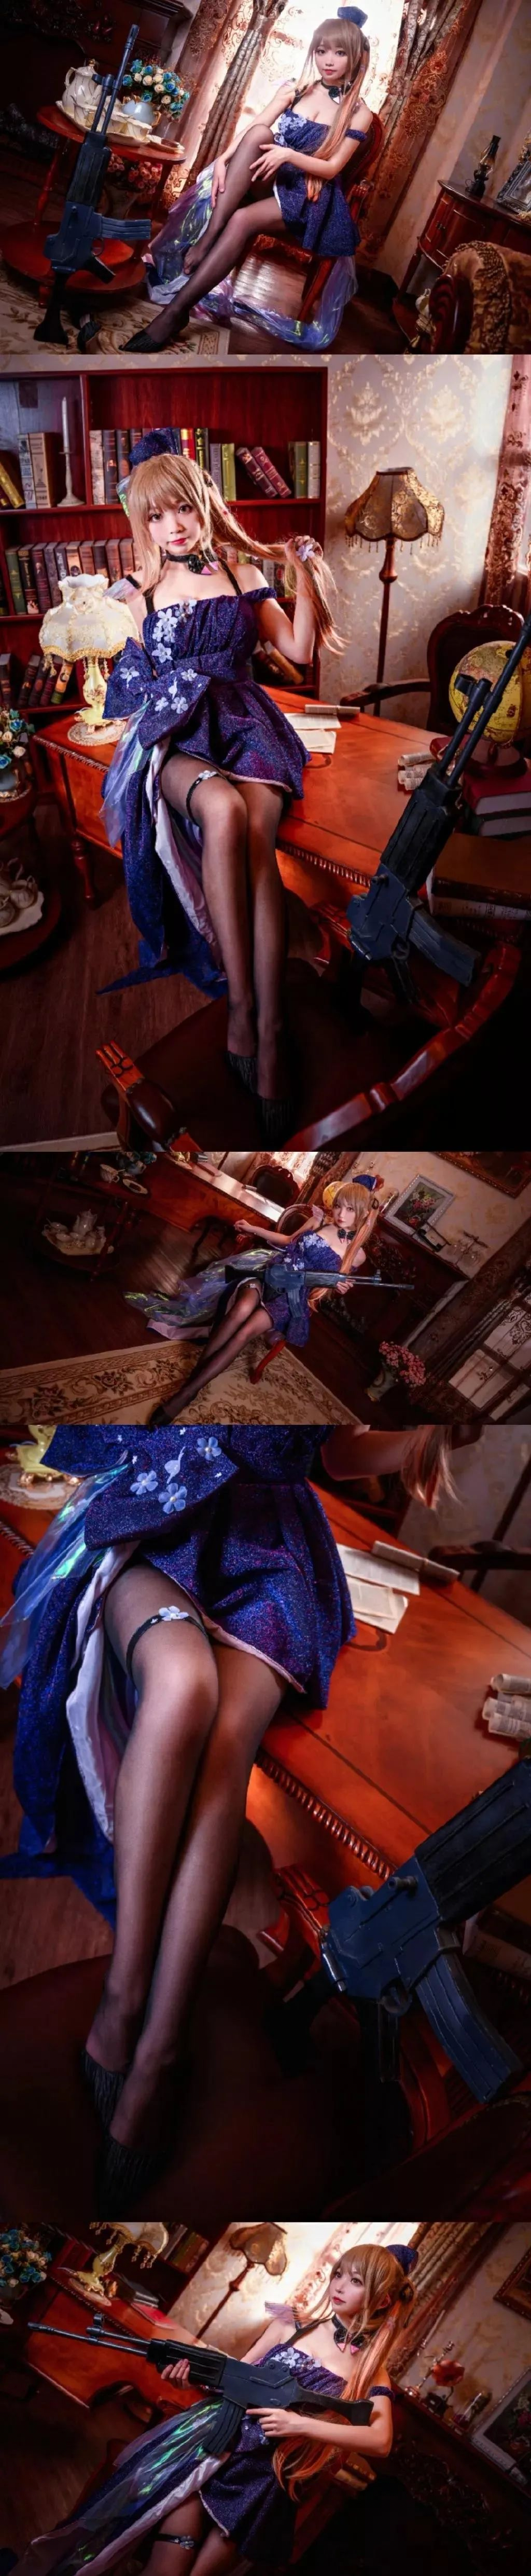 Cosplay—少女前线 K2,又是一双适合舔骨折的黑丝美腿_图片 No.1